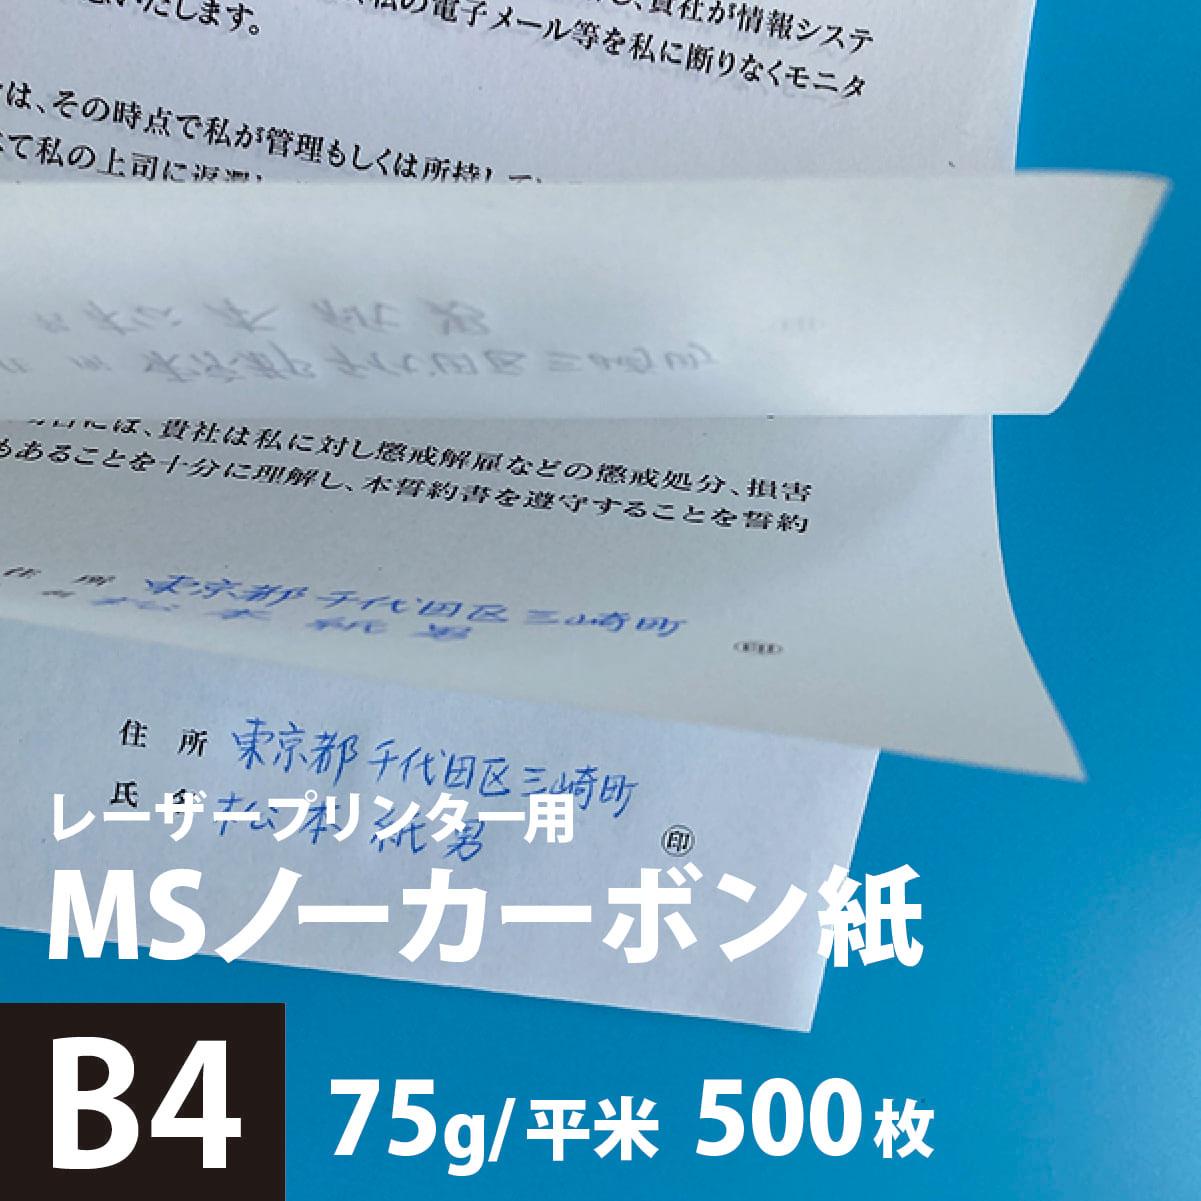 MSノーカーボン紙N50 75g/平米 B4サイズ:500枚, 複写 印刷紙 印刷用紙 複写紙 レーザープリンター用 複写用伝票用紙 伝票印刷 複写用紙 帳票作成 メモ用紙 領収書印刷 松本洋紙店